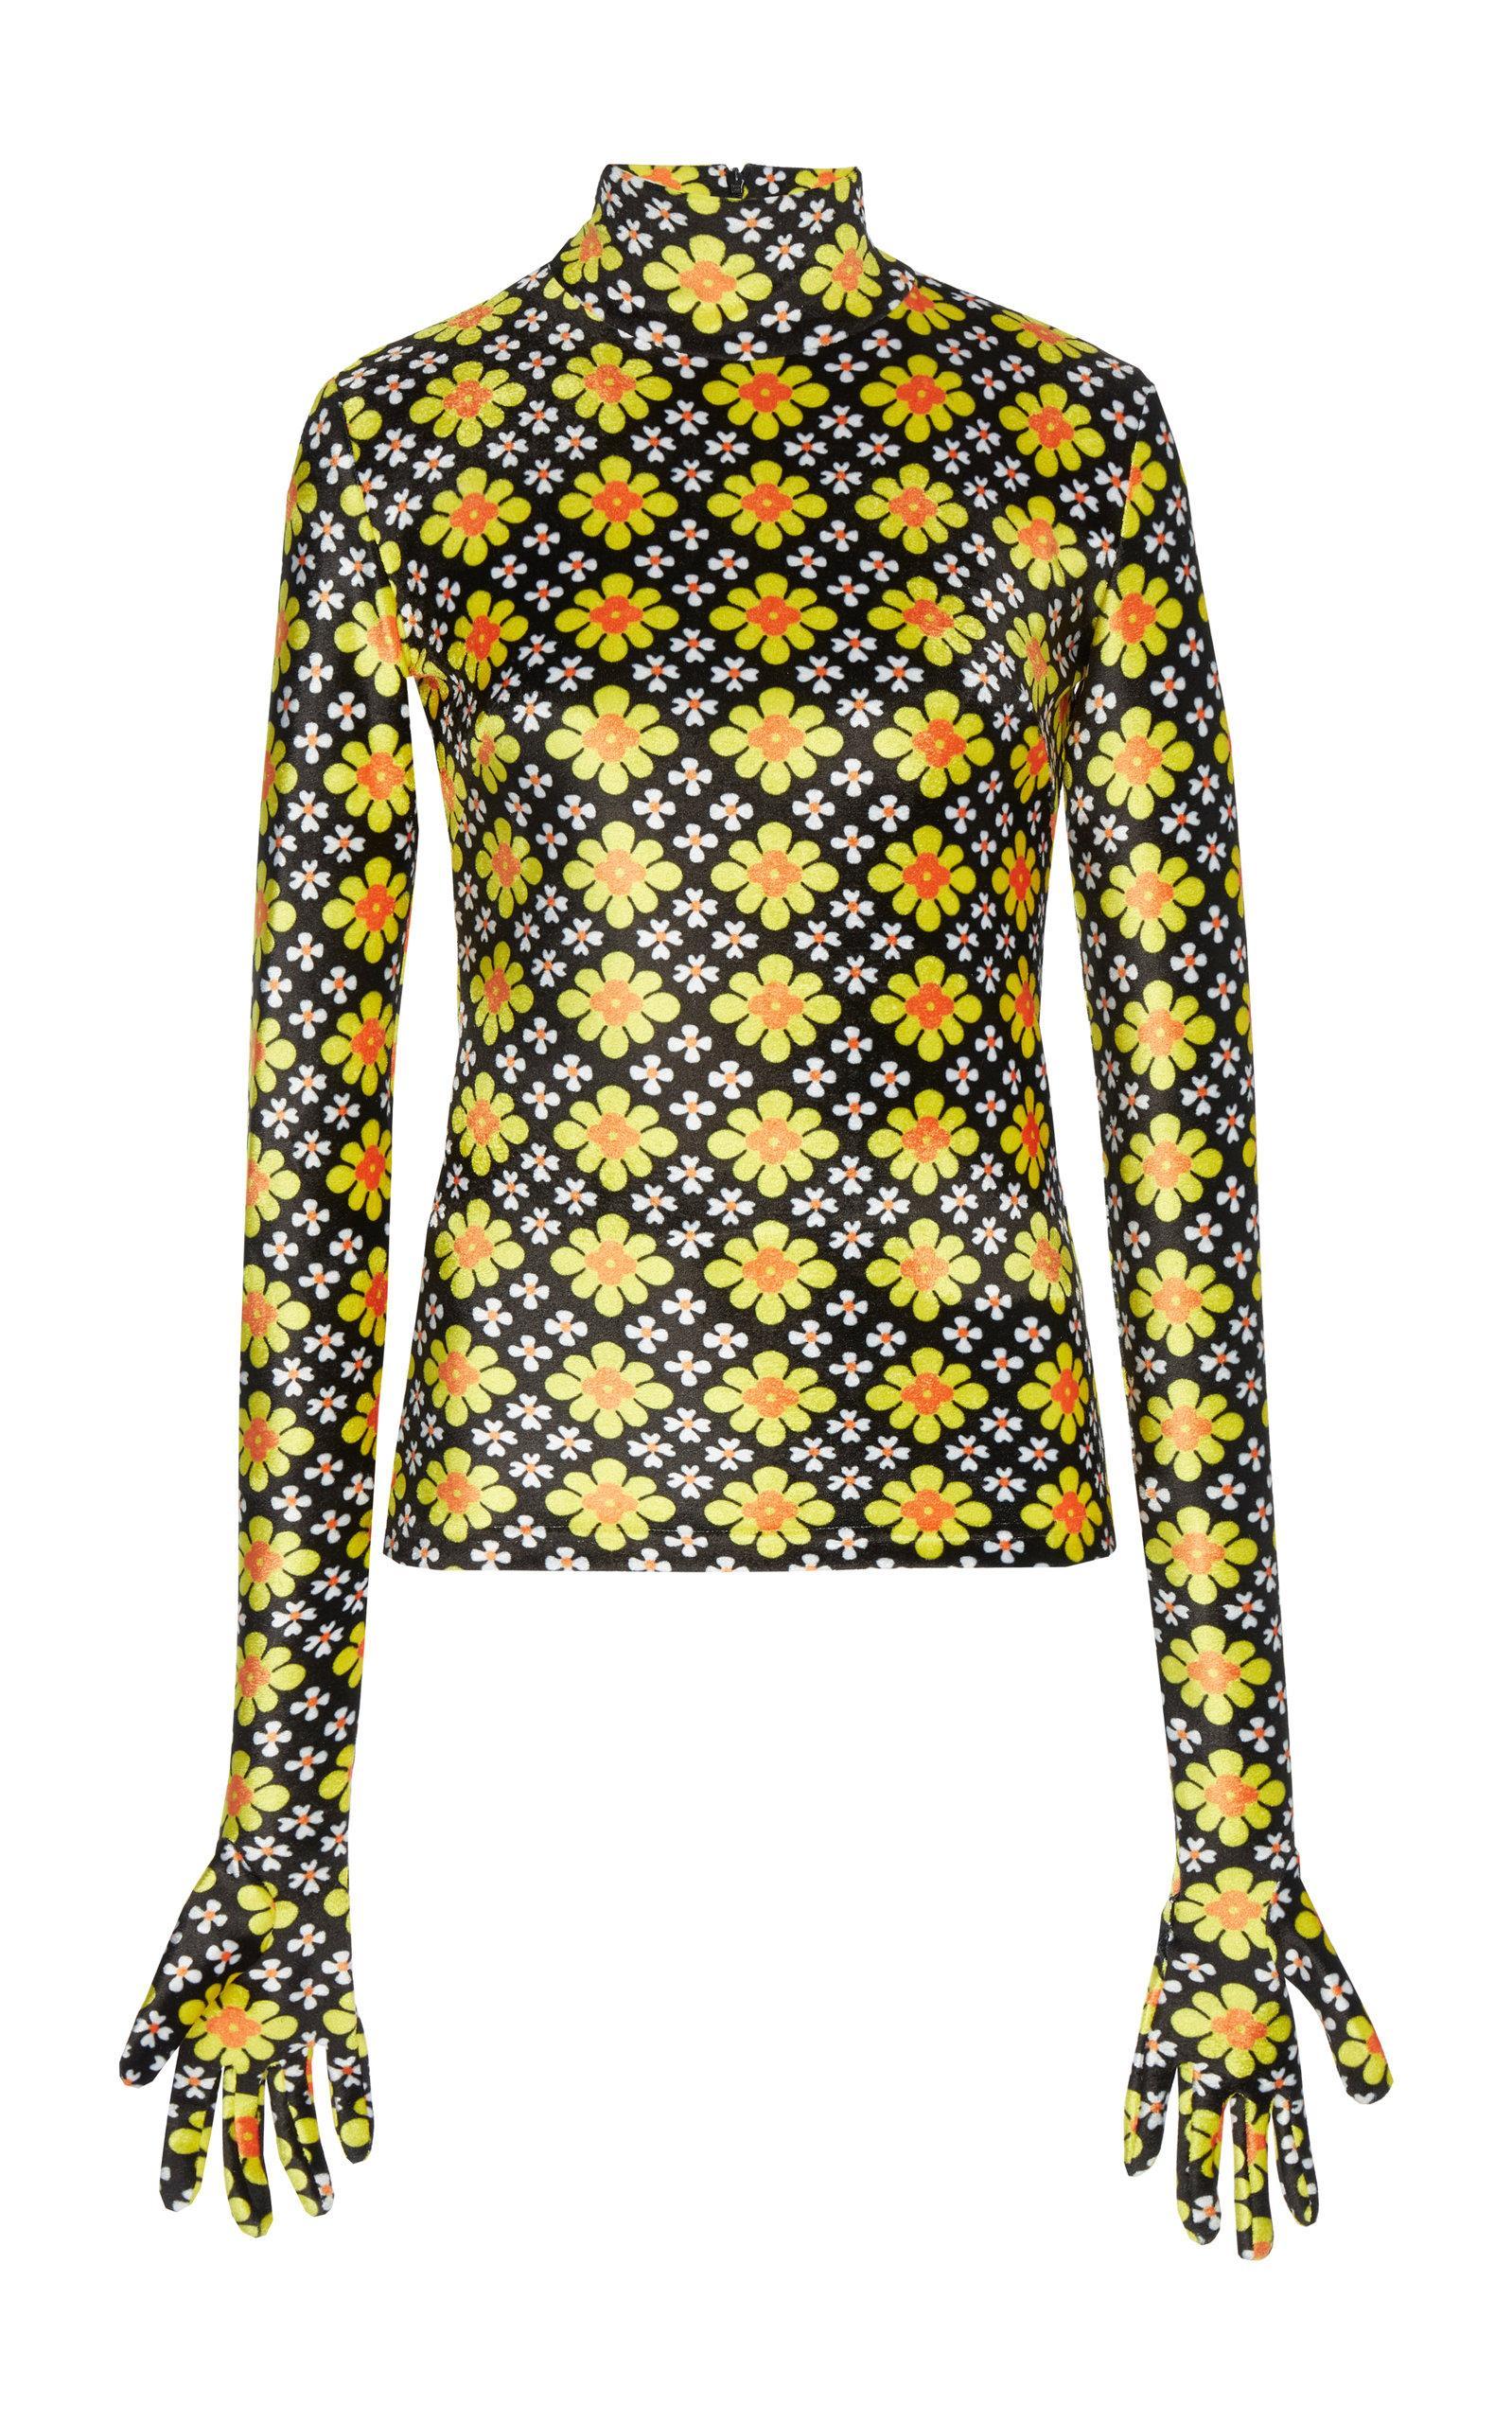 Richard Quinn Printed Roll Neck Top